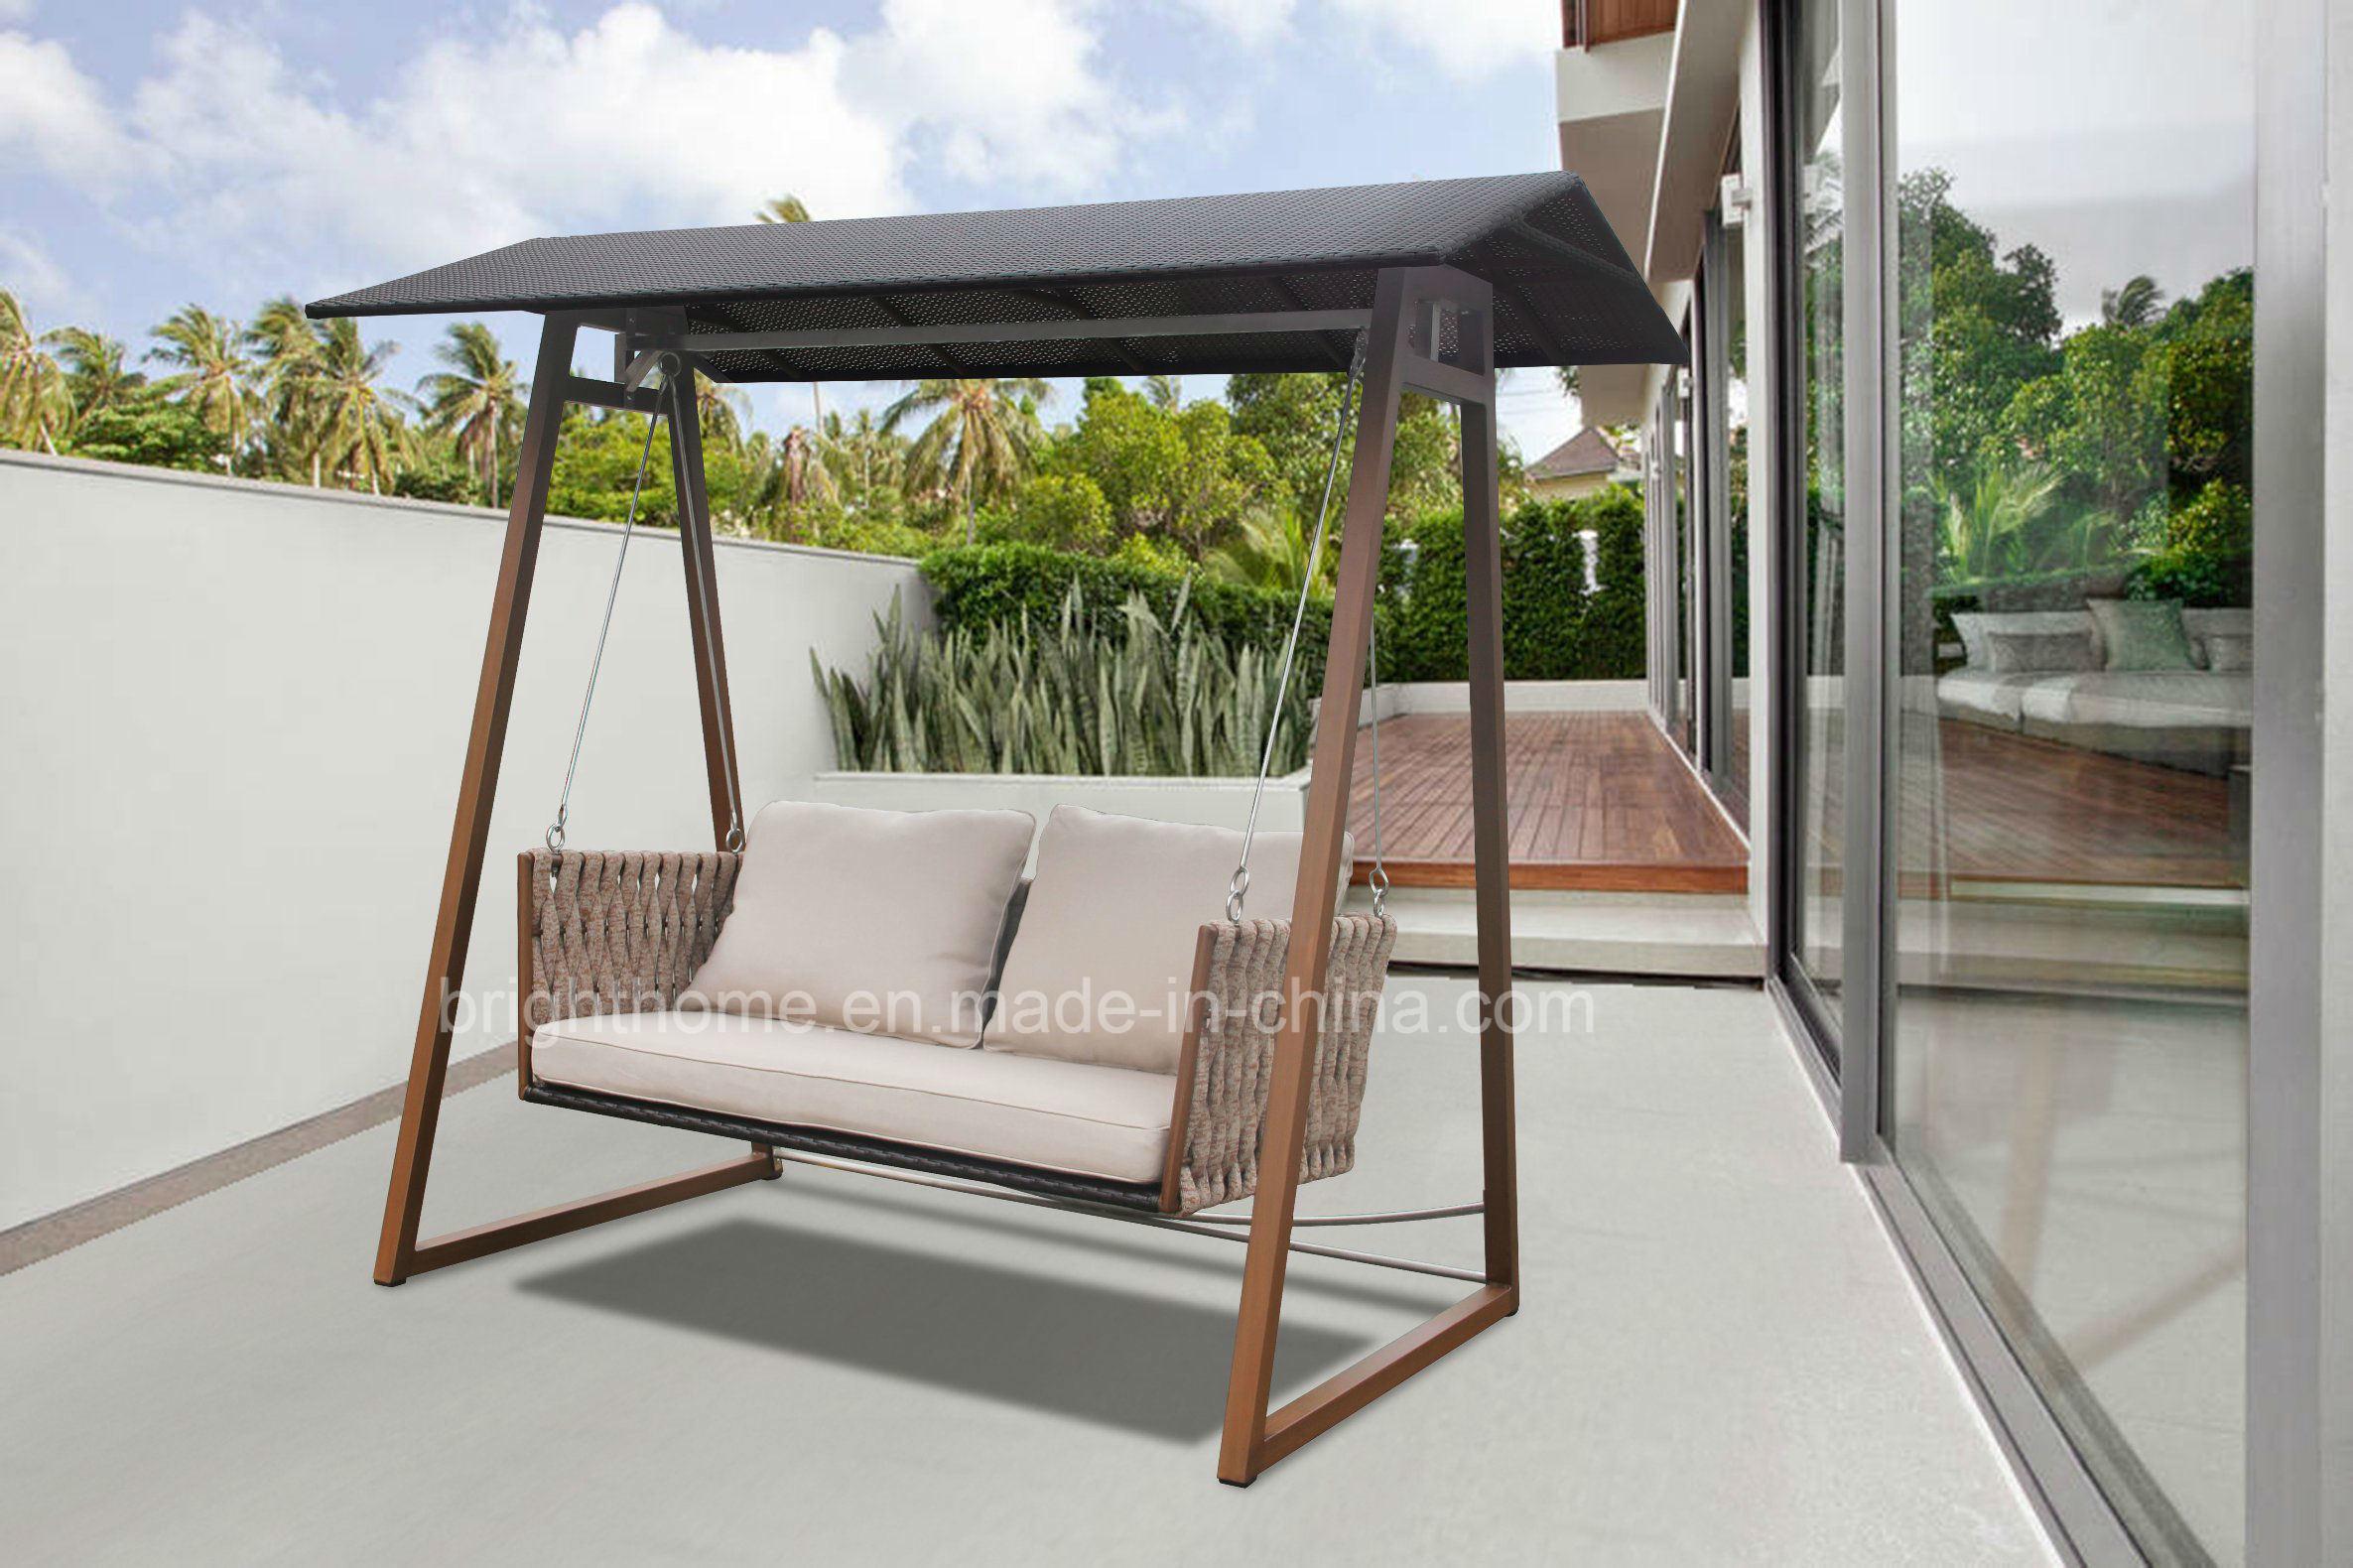 China Outdoor Leisure Textilene Rope Garden Hanging Swing Patio Furniture Hanging Chair Bp 617g China Swing Garden Swing